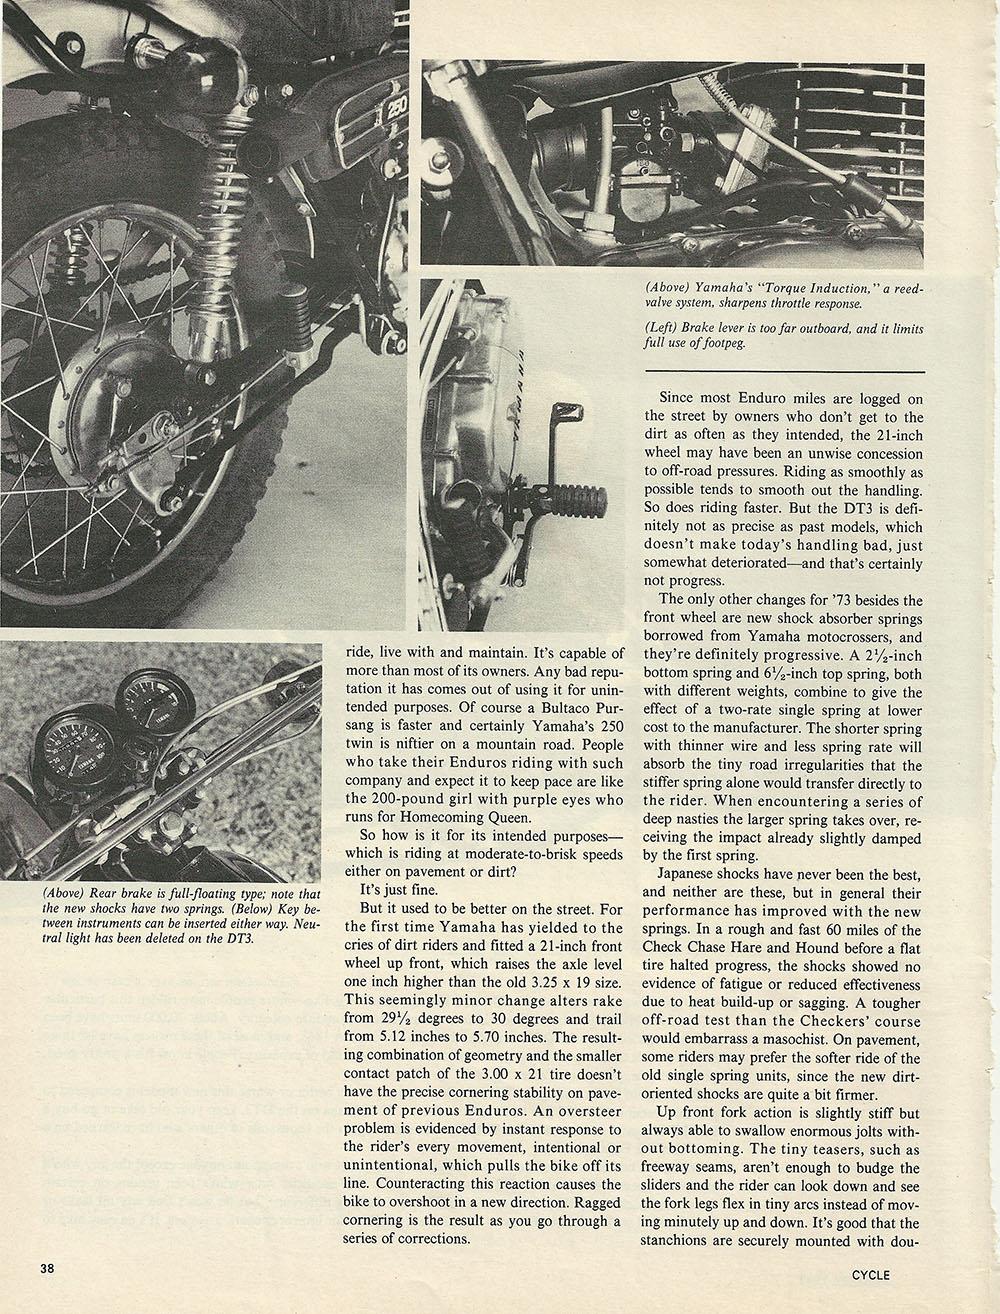 1973 Yamaha DT3 Enduro 250 road test p2.JPG